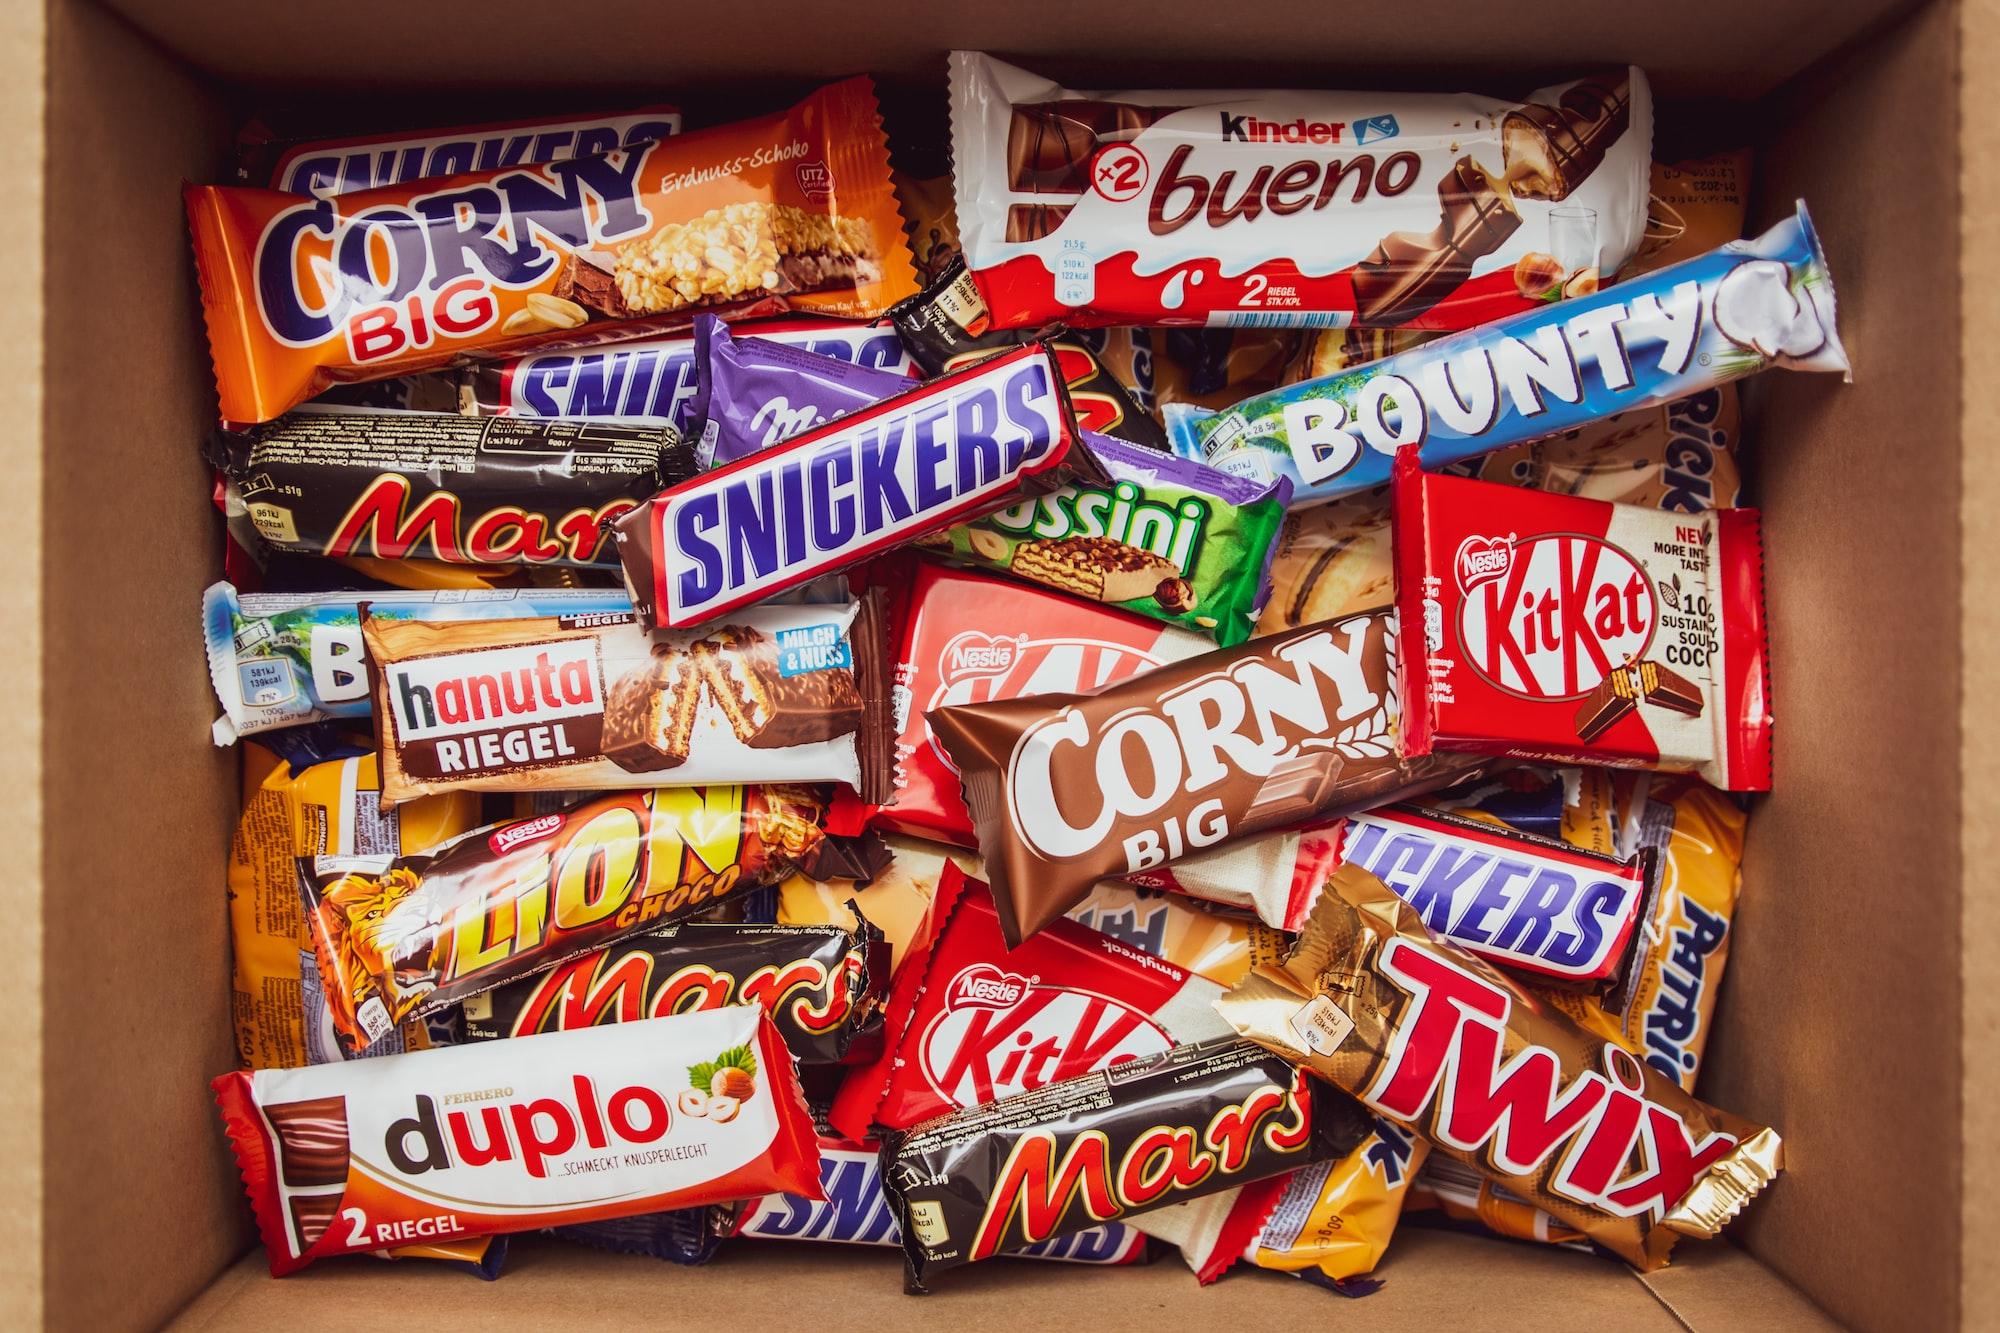 A box full of various chocolate bars